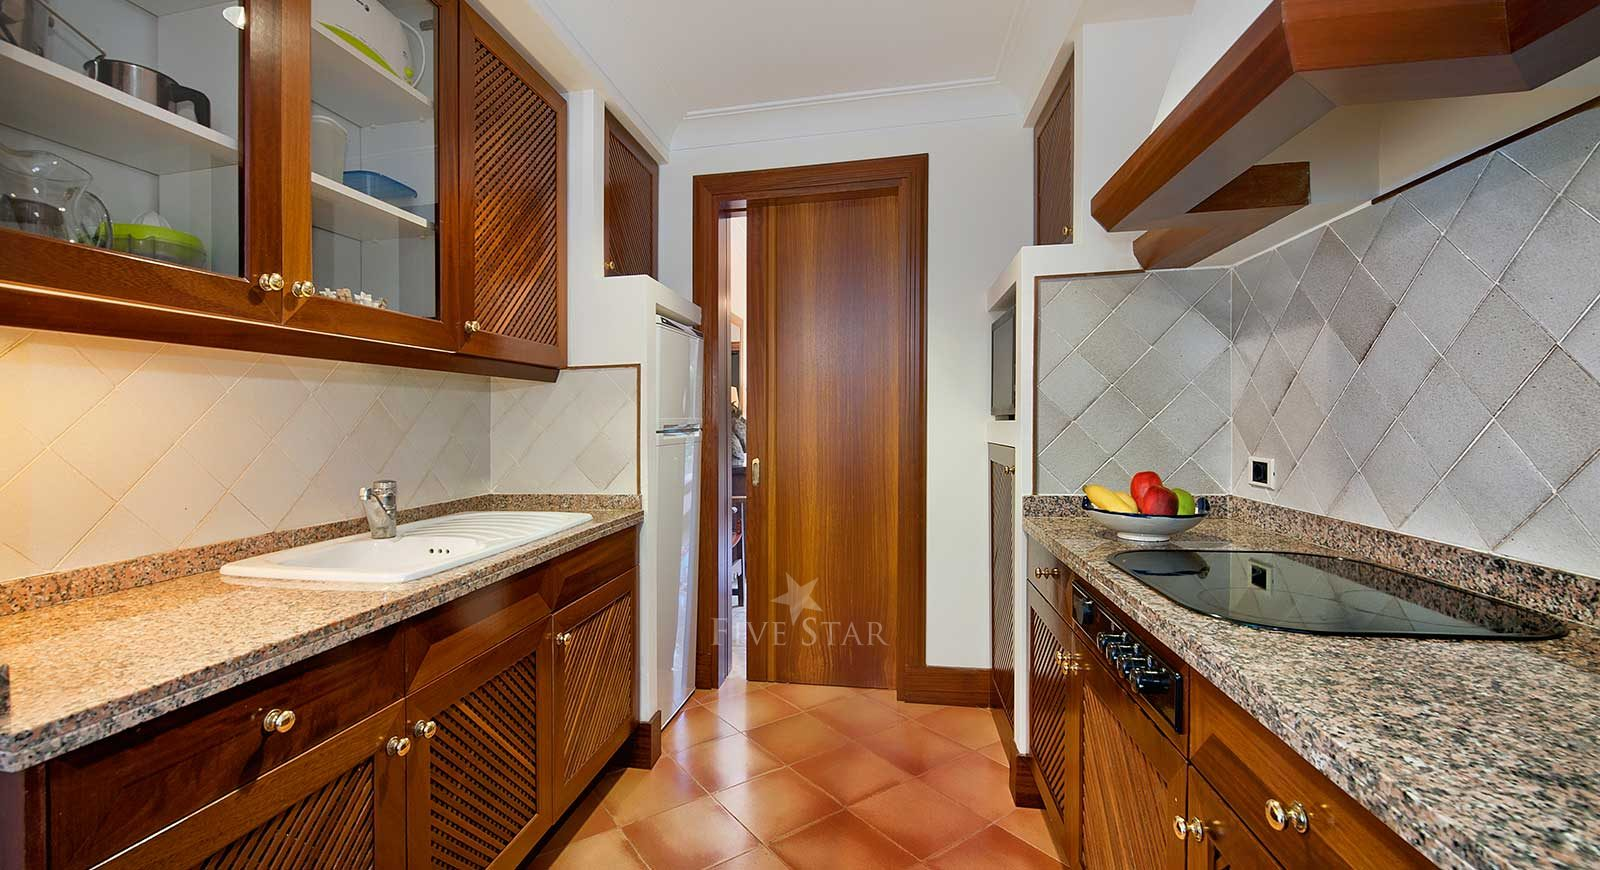 Barceló Formentor photo 20